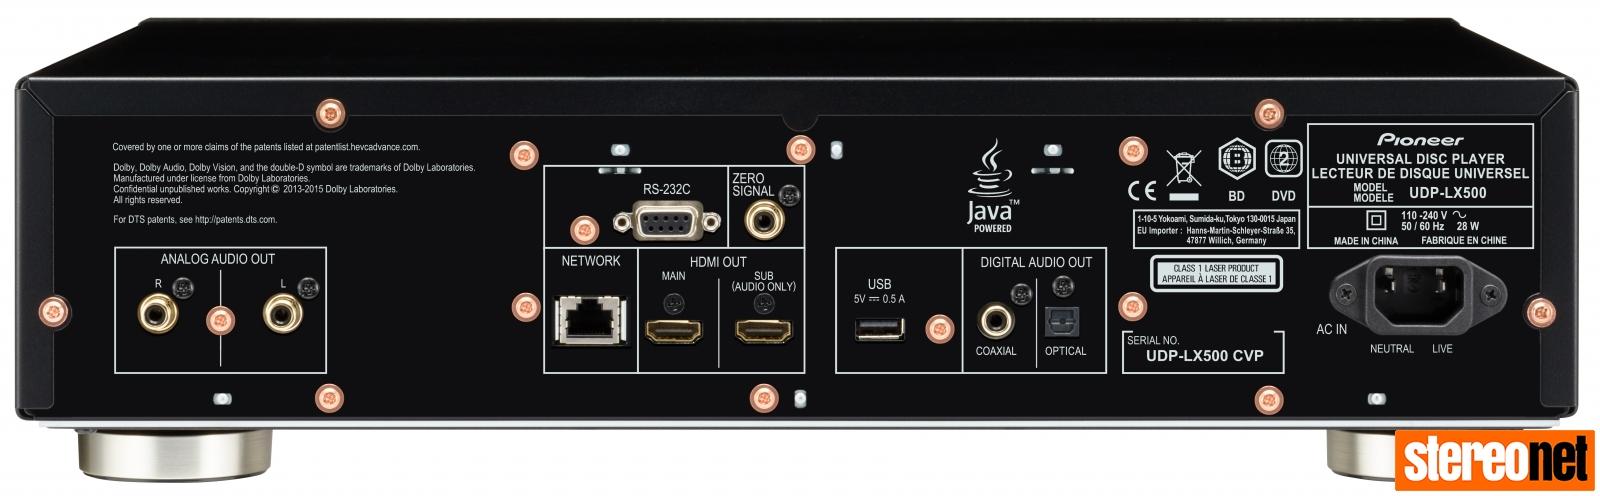 Pioneer UDP-LX500 rear panel